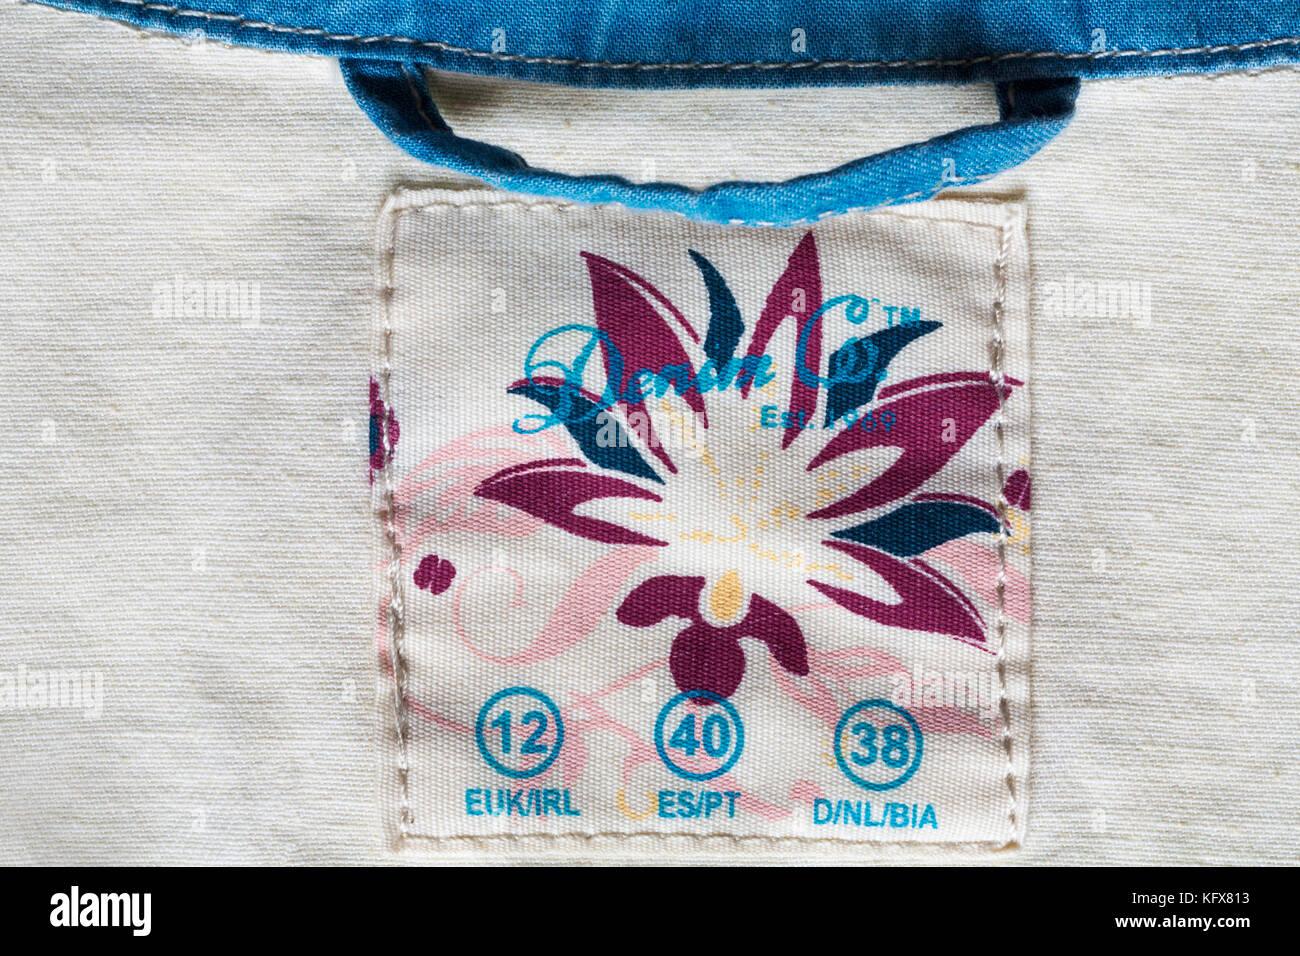 Denim & Co label in woman's denim shirt - Stock Image